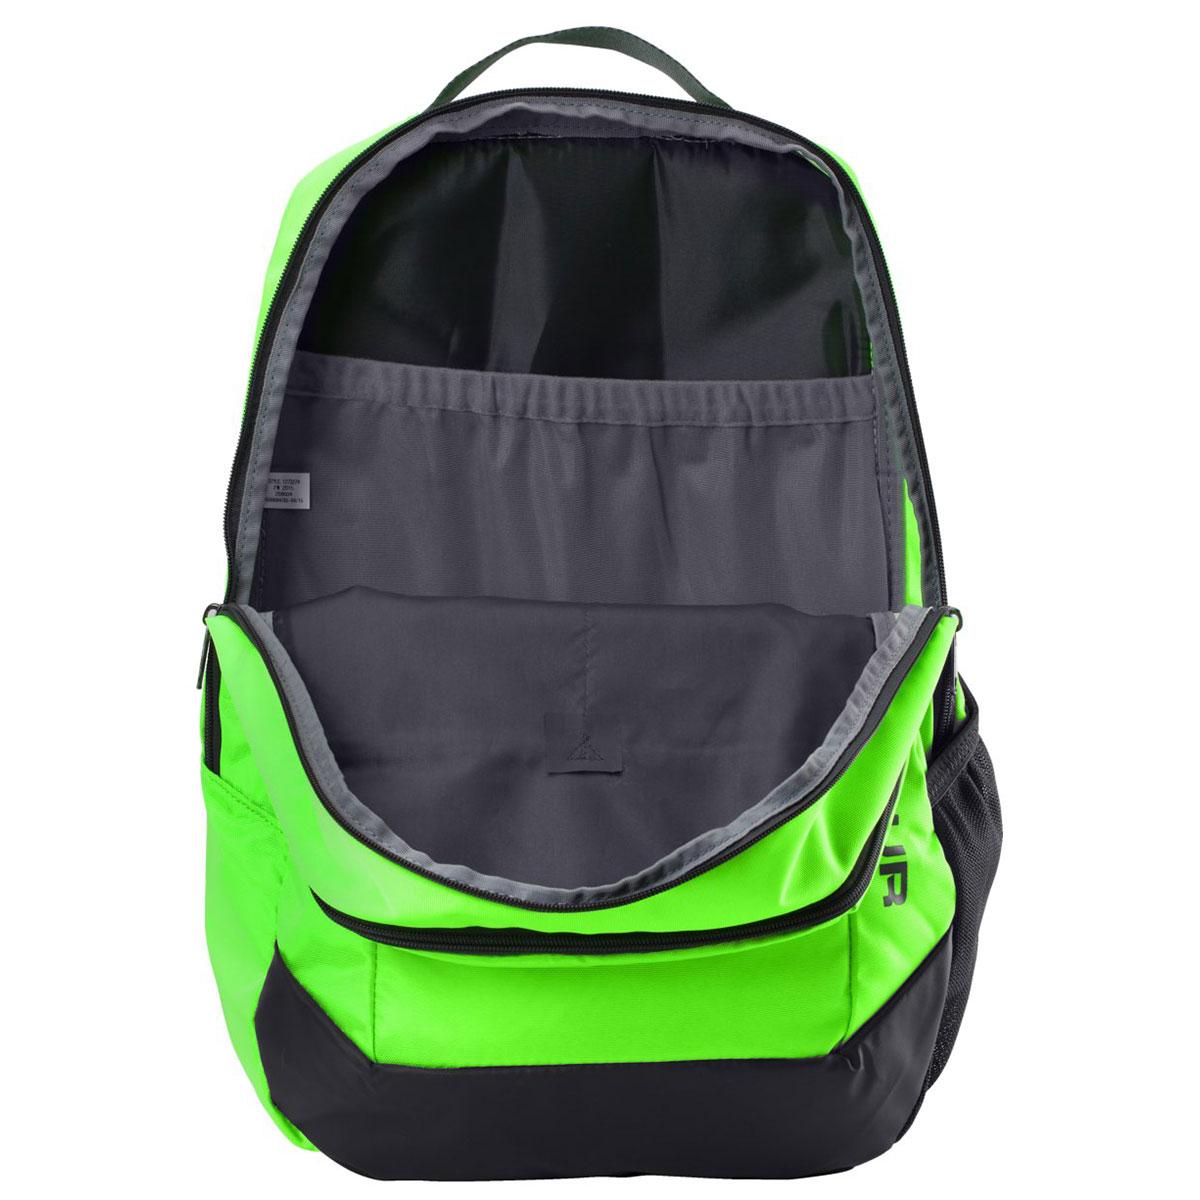 ua hustle ldwr backpack review